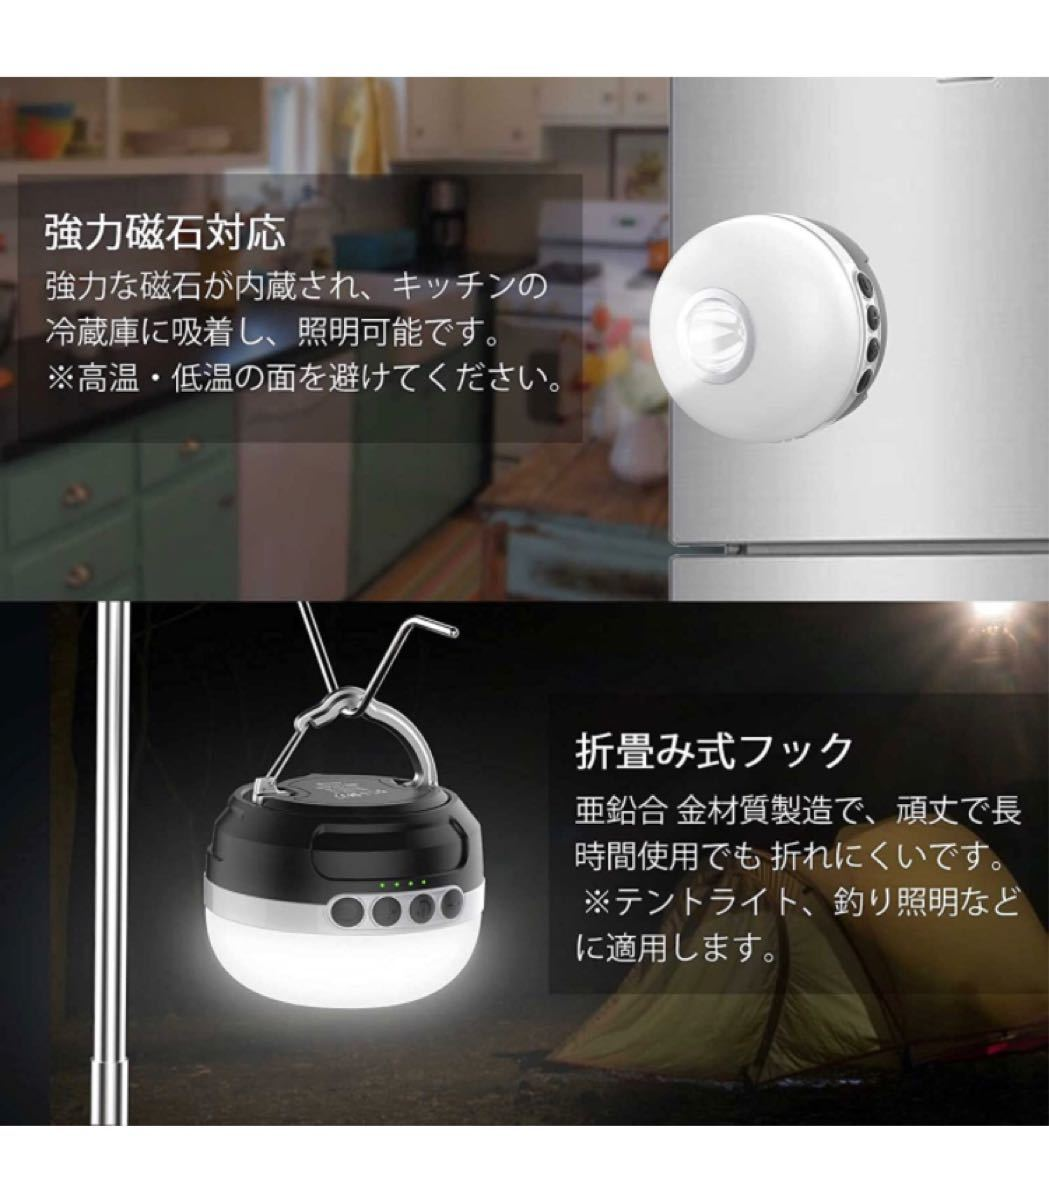 LEDランタン 充電式 懐中電灯 四色切替+RGB雰囲気灯 10400mAh大容量電池 無段階調光 暖色 昼白色 自然色